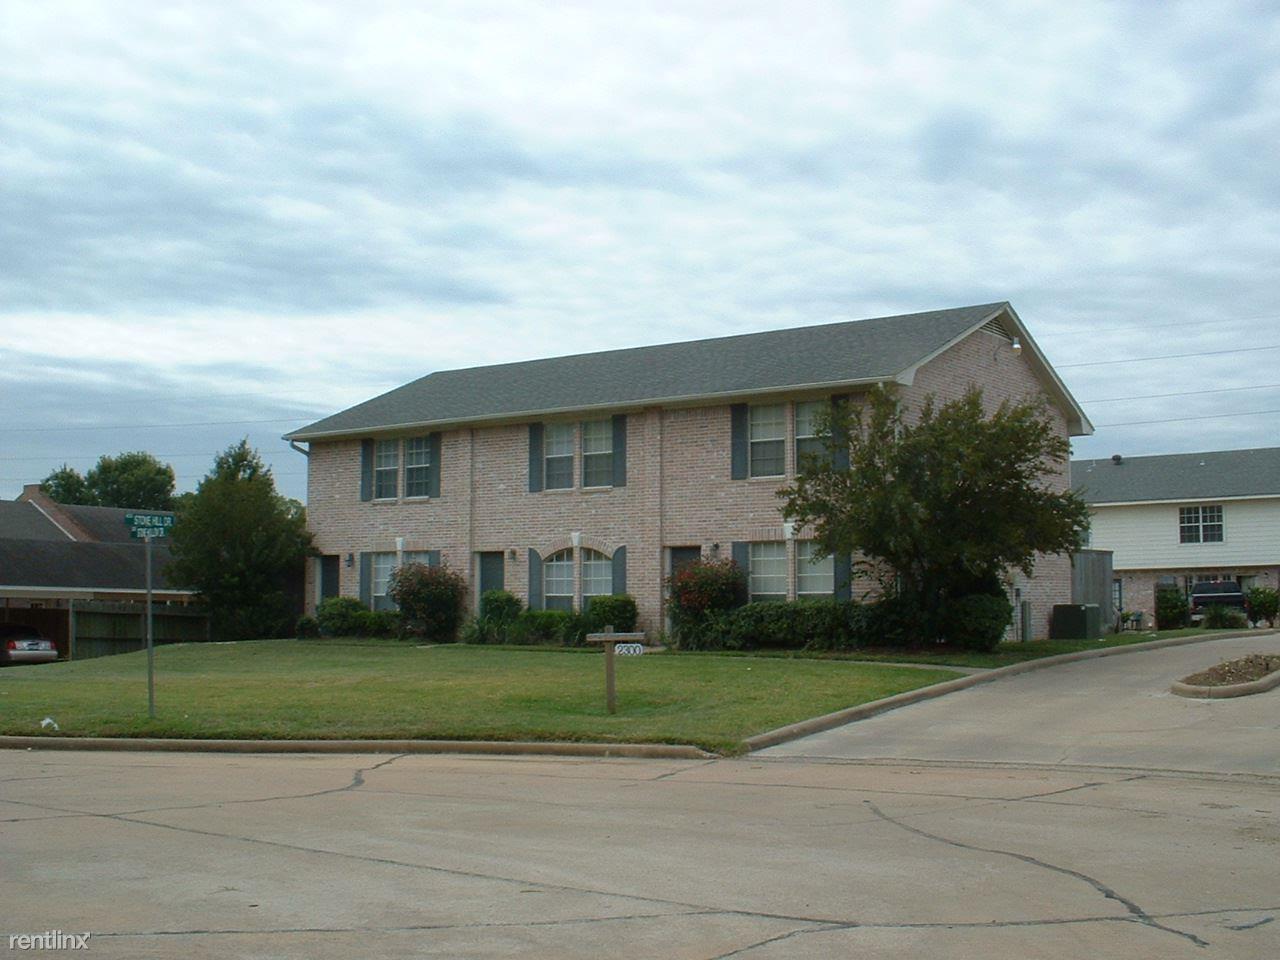 2300 Stone Hollow Dr, Brenham, TX - $950